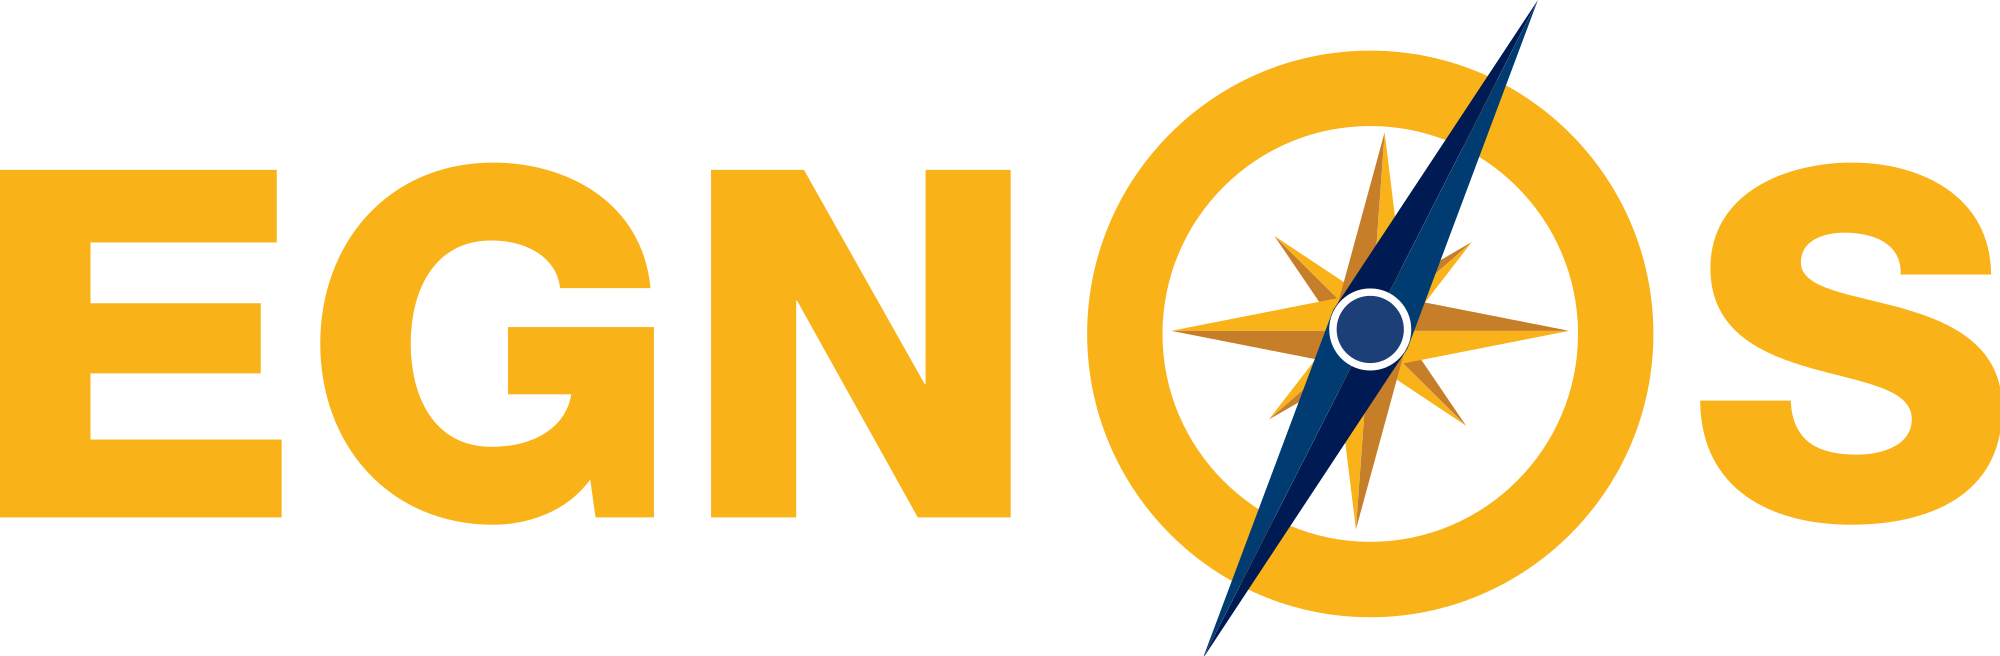 EGNOS - The European Geostationary Navigation Overlay Service